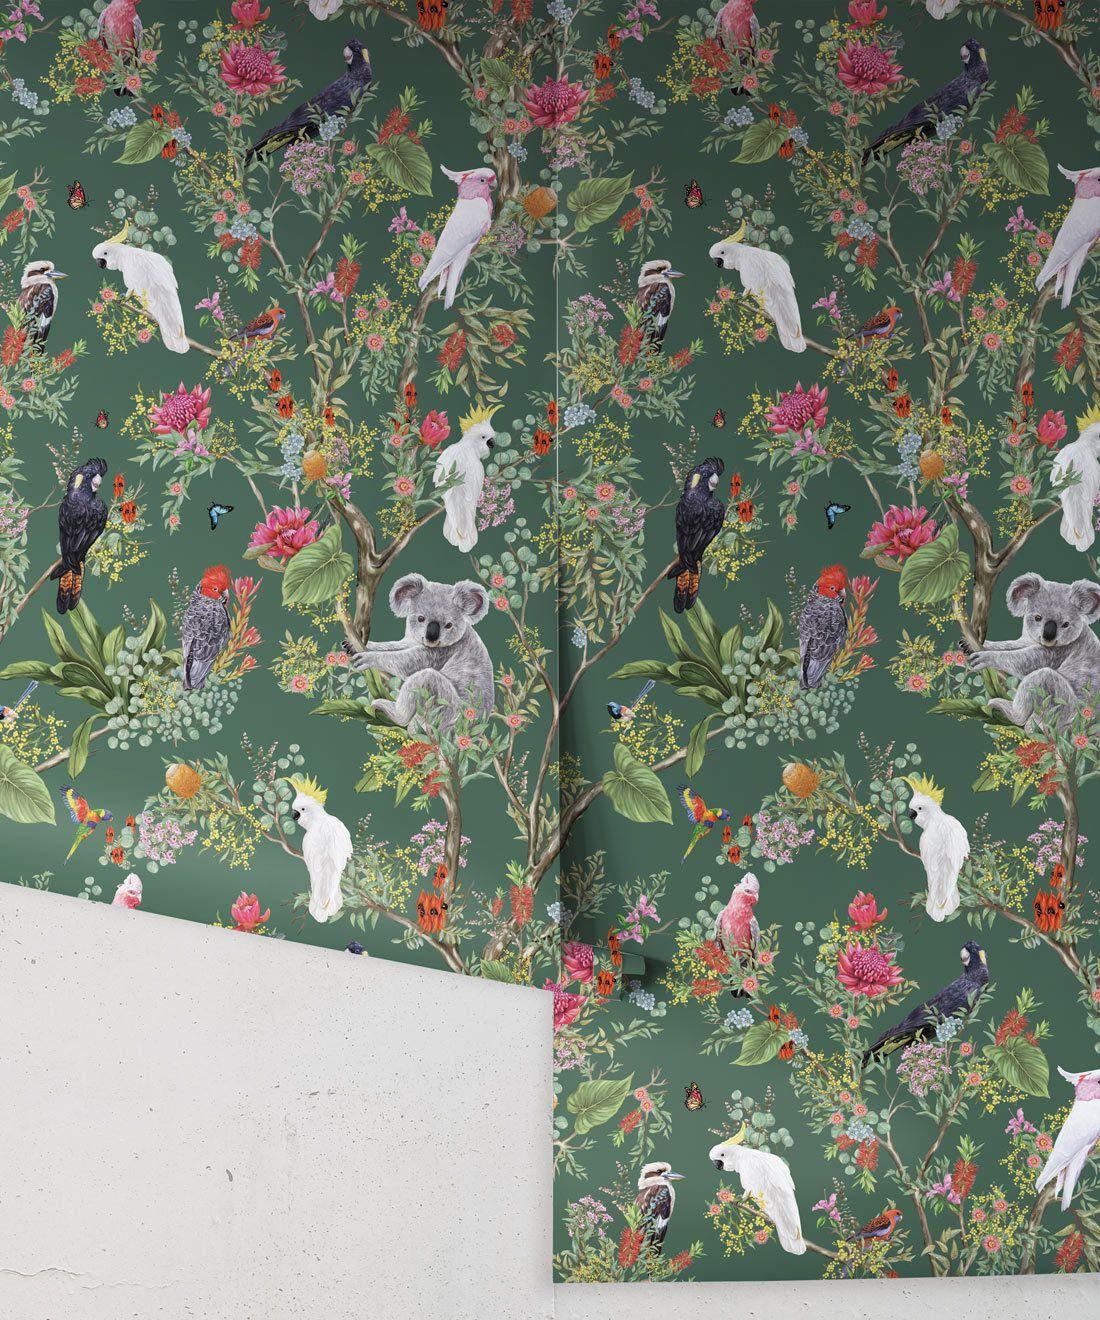 Australia Wallpaper • Cockatoos, Koalas, Parrots, Finches • Milton & King USA • Green Wallpaper Roll